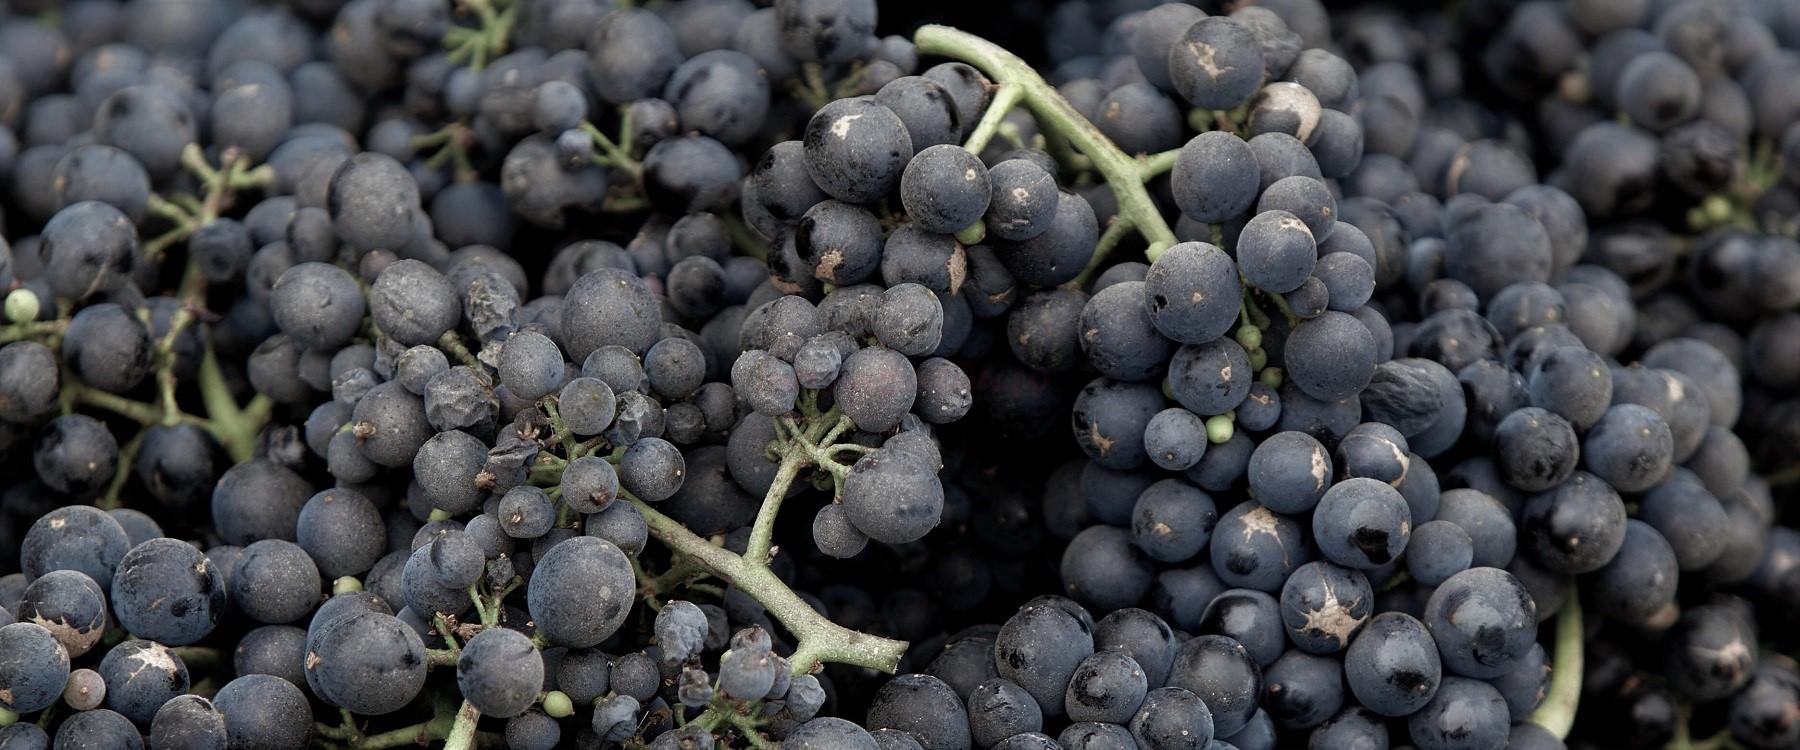 ciorchini struguri pinot noire, ilustratie dicționar viticol